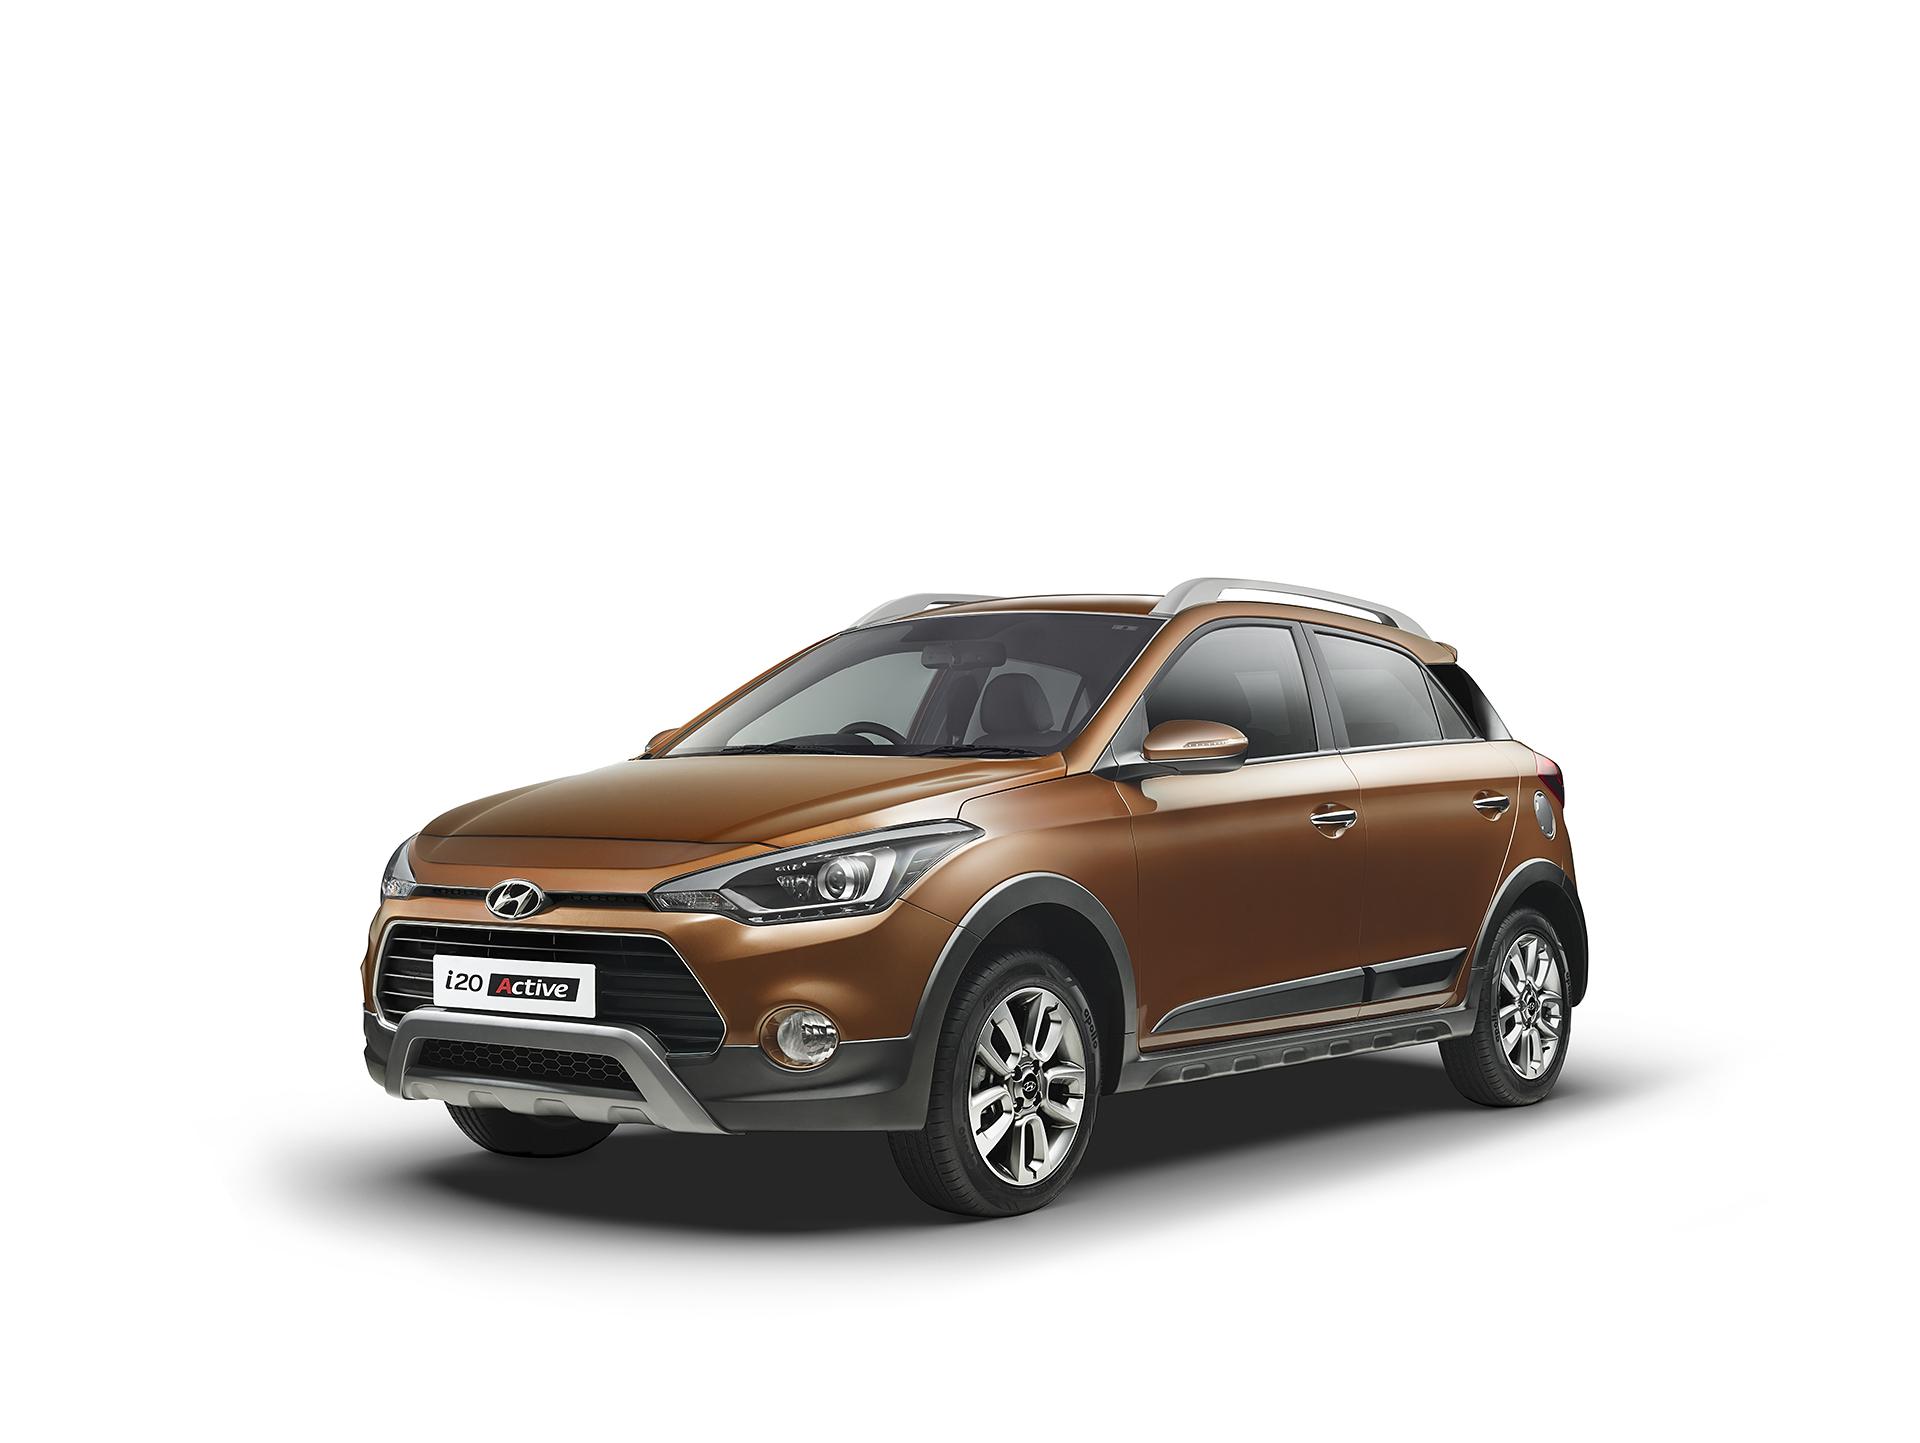 Hyundai i20 Active Brown Studio Med